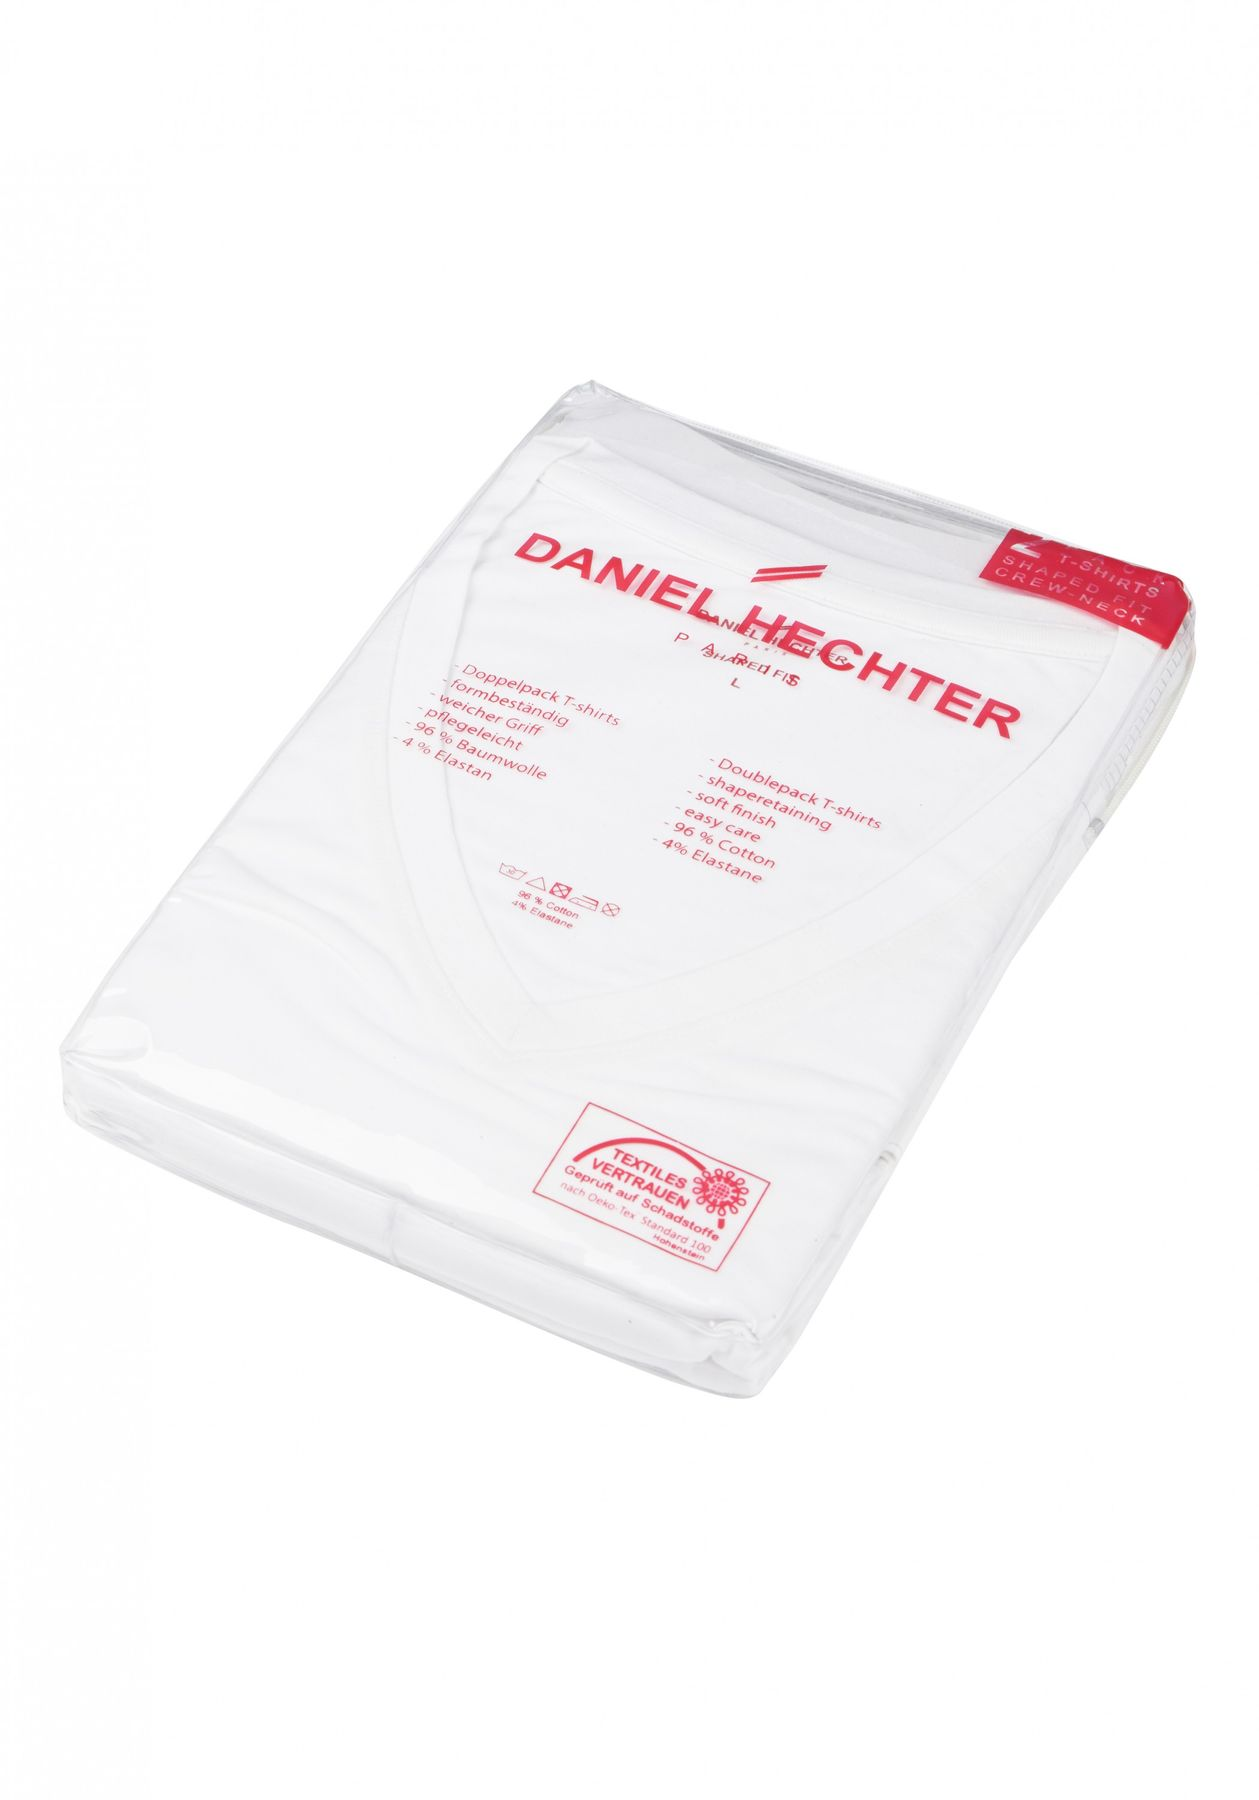 Daniel Hechter - Shaped Fit -  Doppelpack Herren Kurzarm T-Shirt in weiß, S-3XL (470 10281) – Bild 3